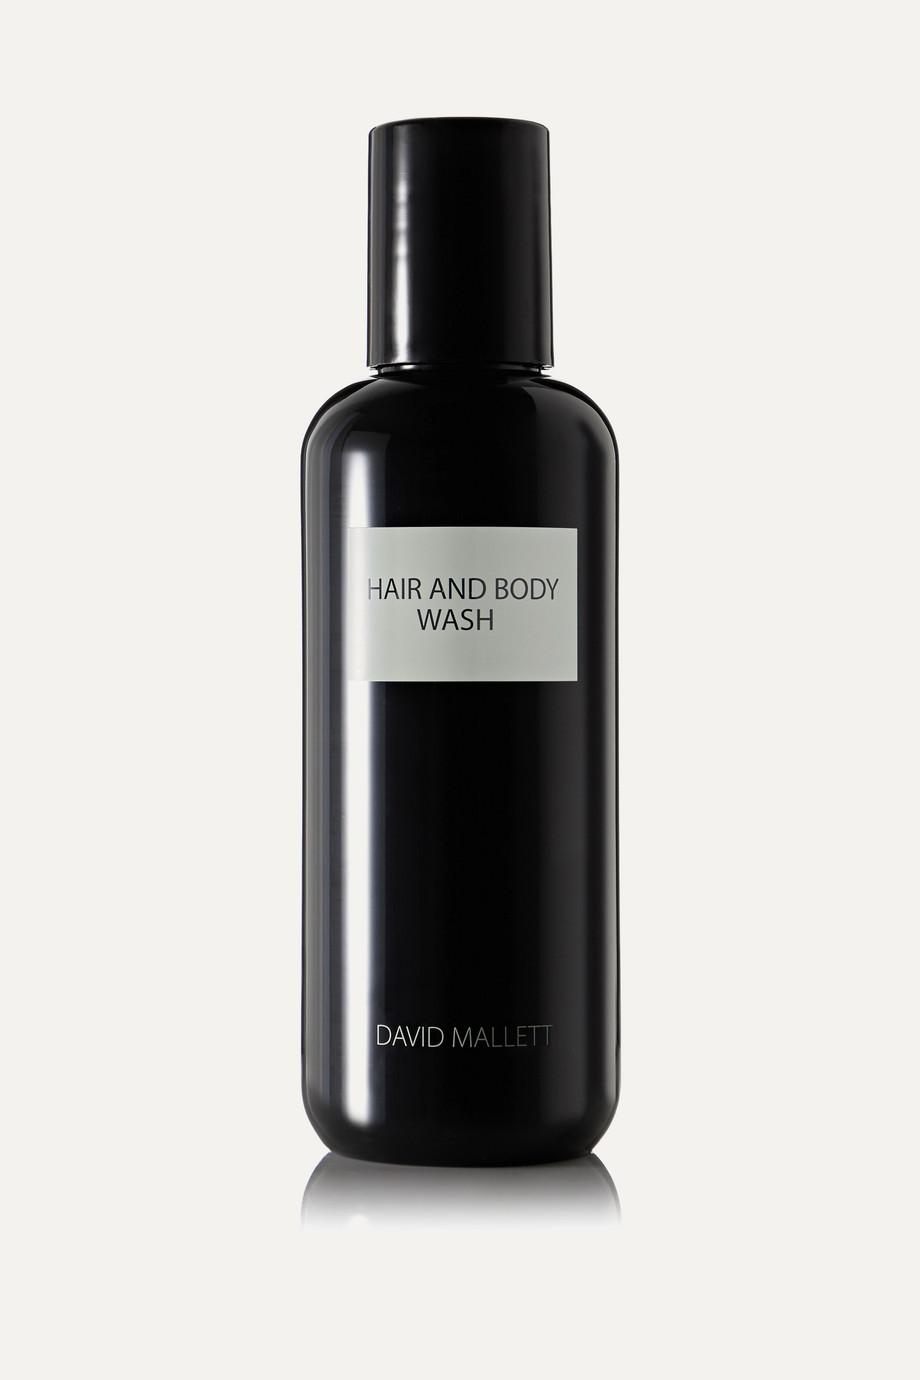 David Mallett Hair & Body Wash, 250 ml – 2-in-1 Shampoo und Duschgel